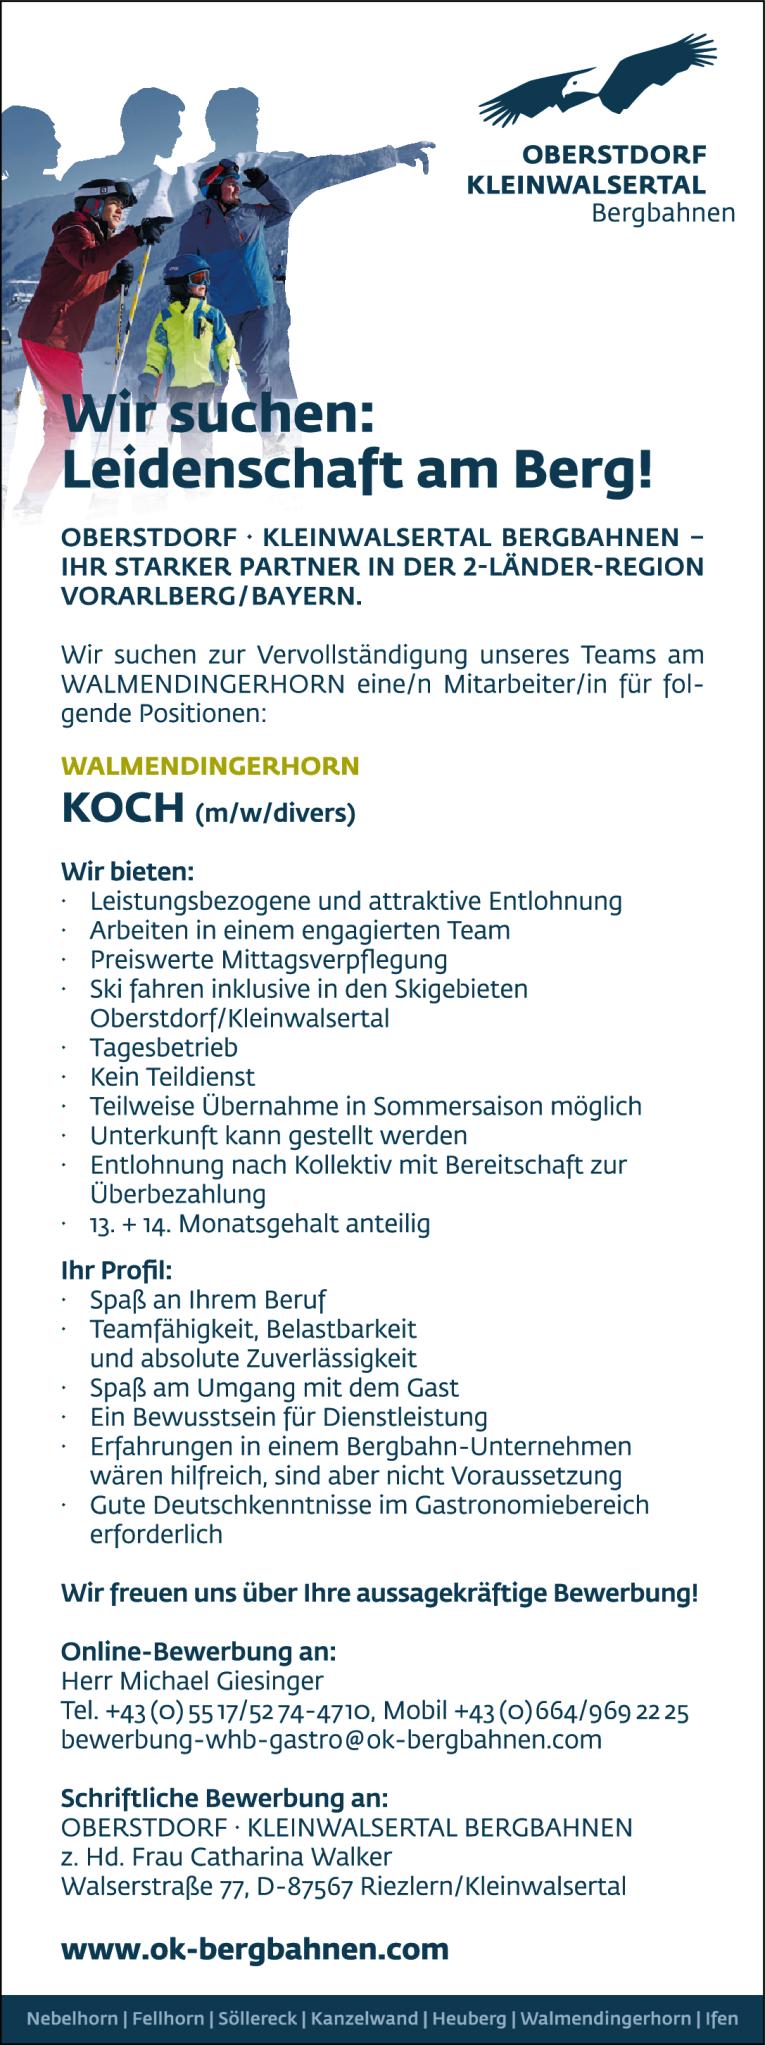 Job Koch Mwdivers Für Das Walmendingerhorn